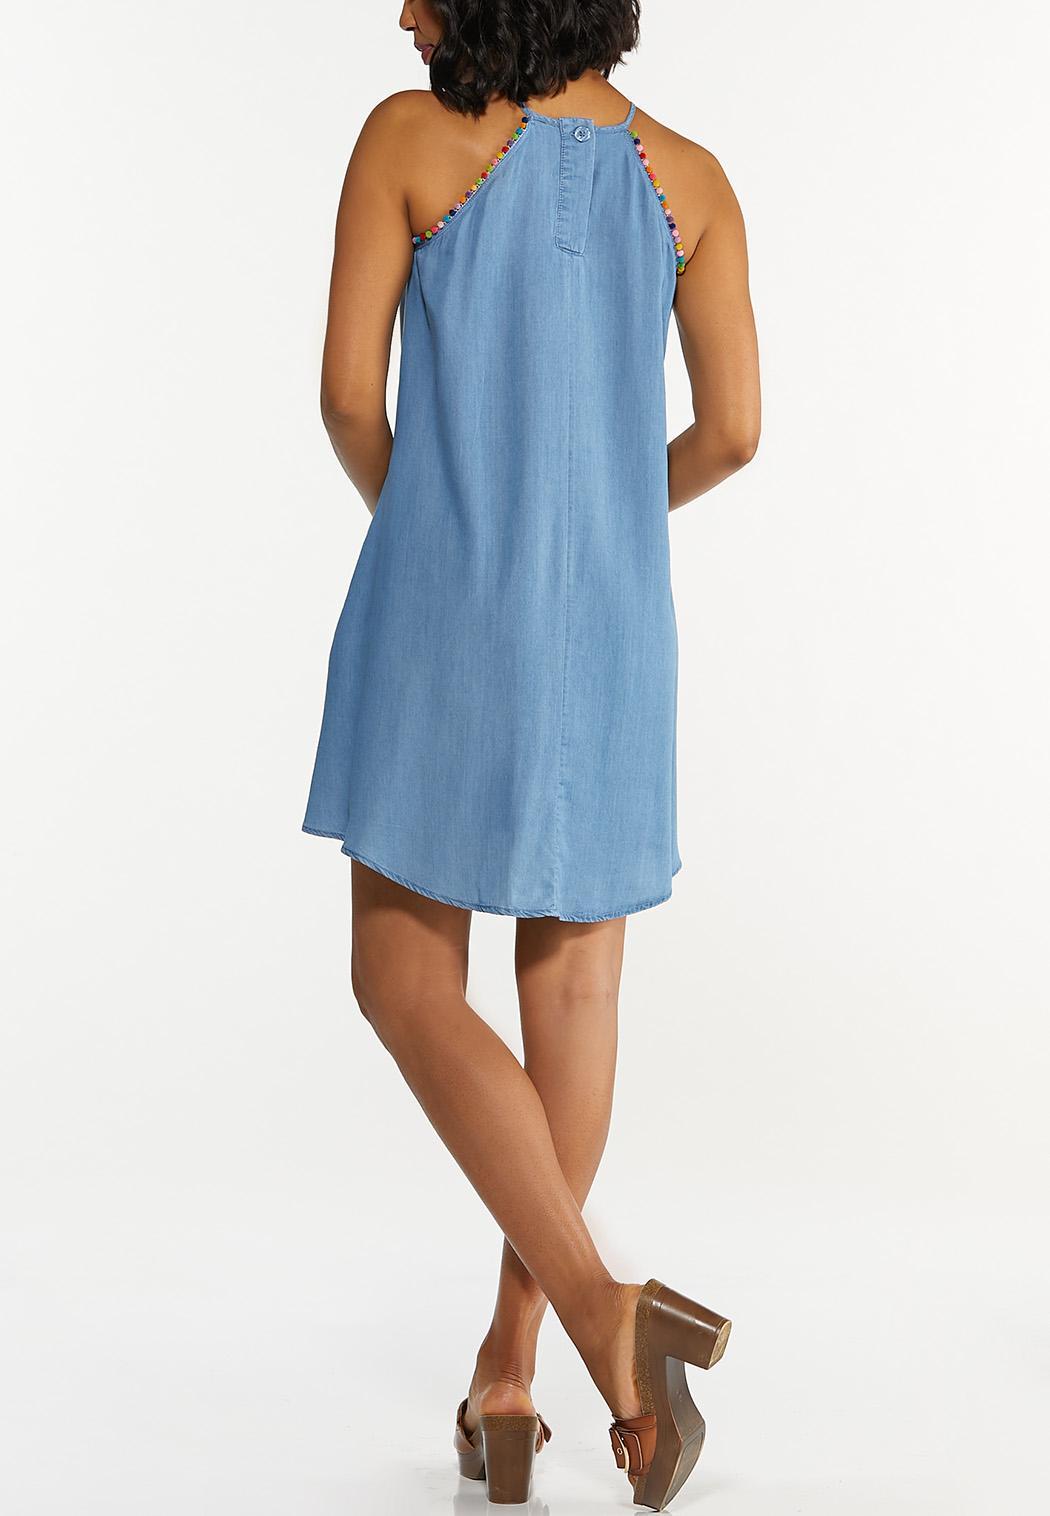 Chambray Pom-Pom Swing Dress (Item #44272064)